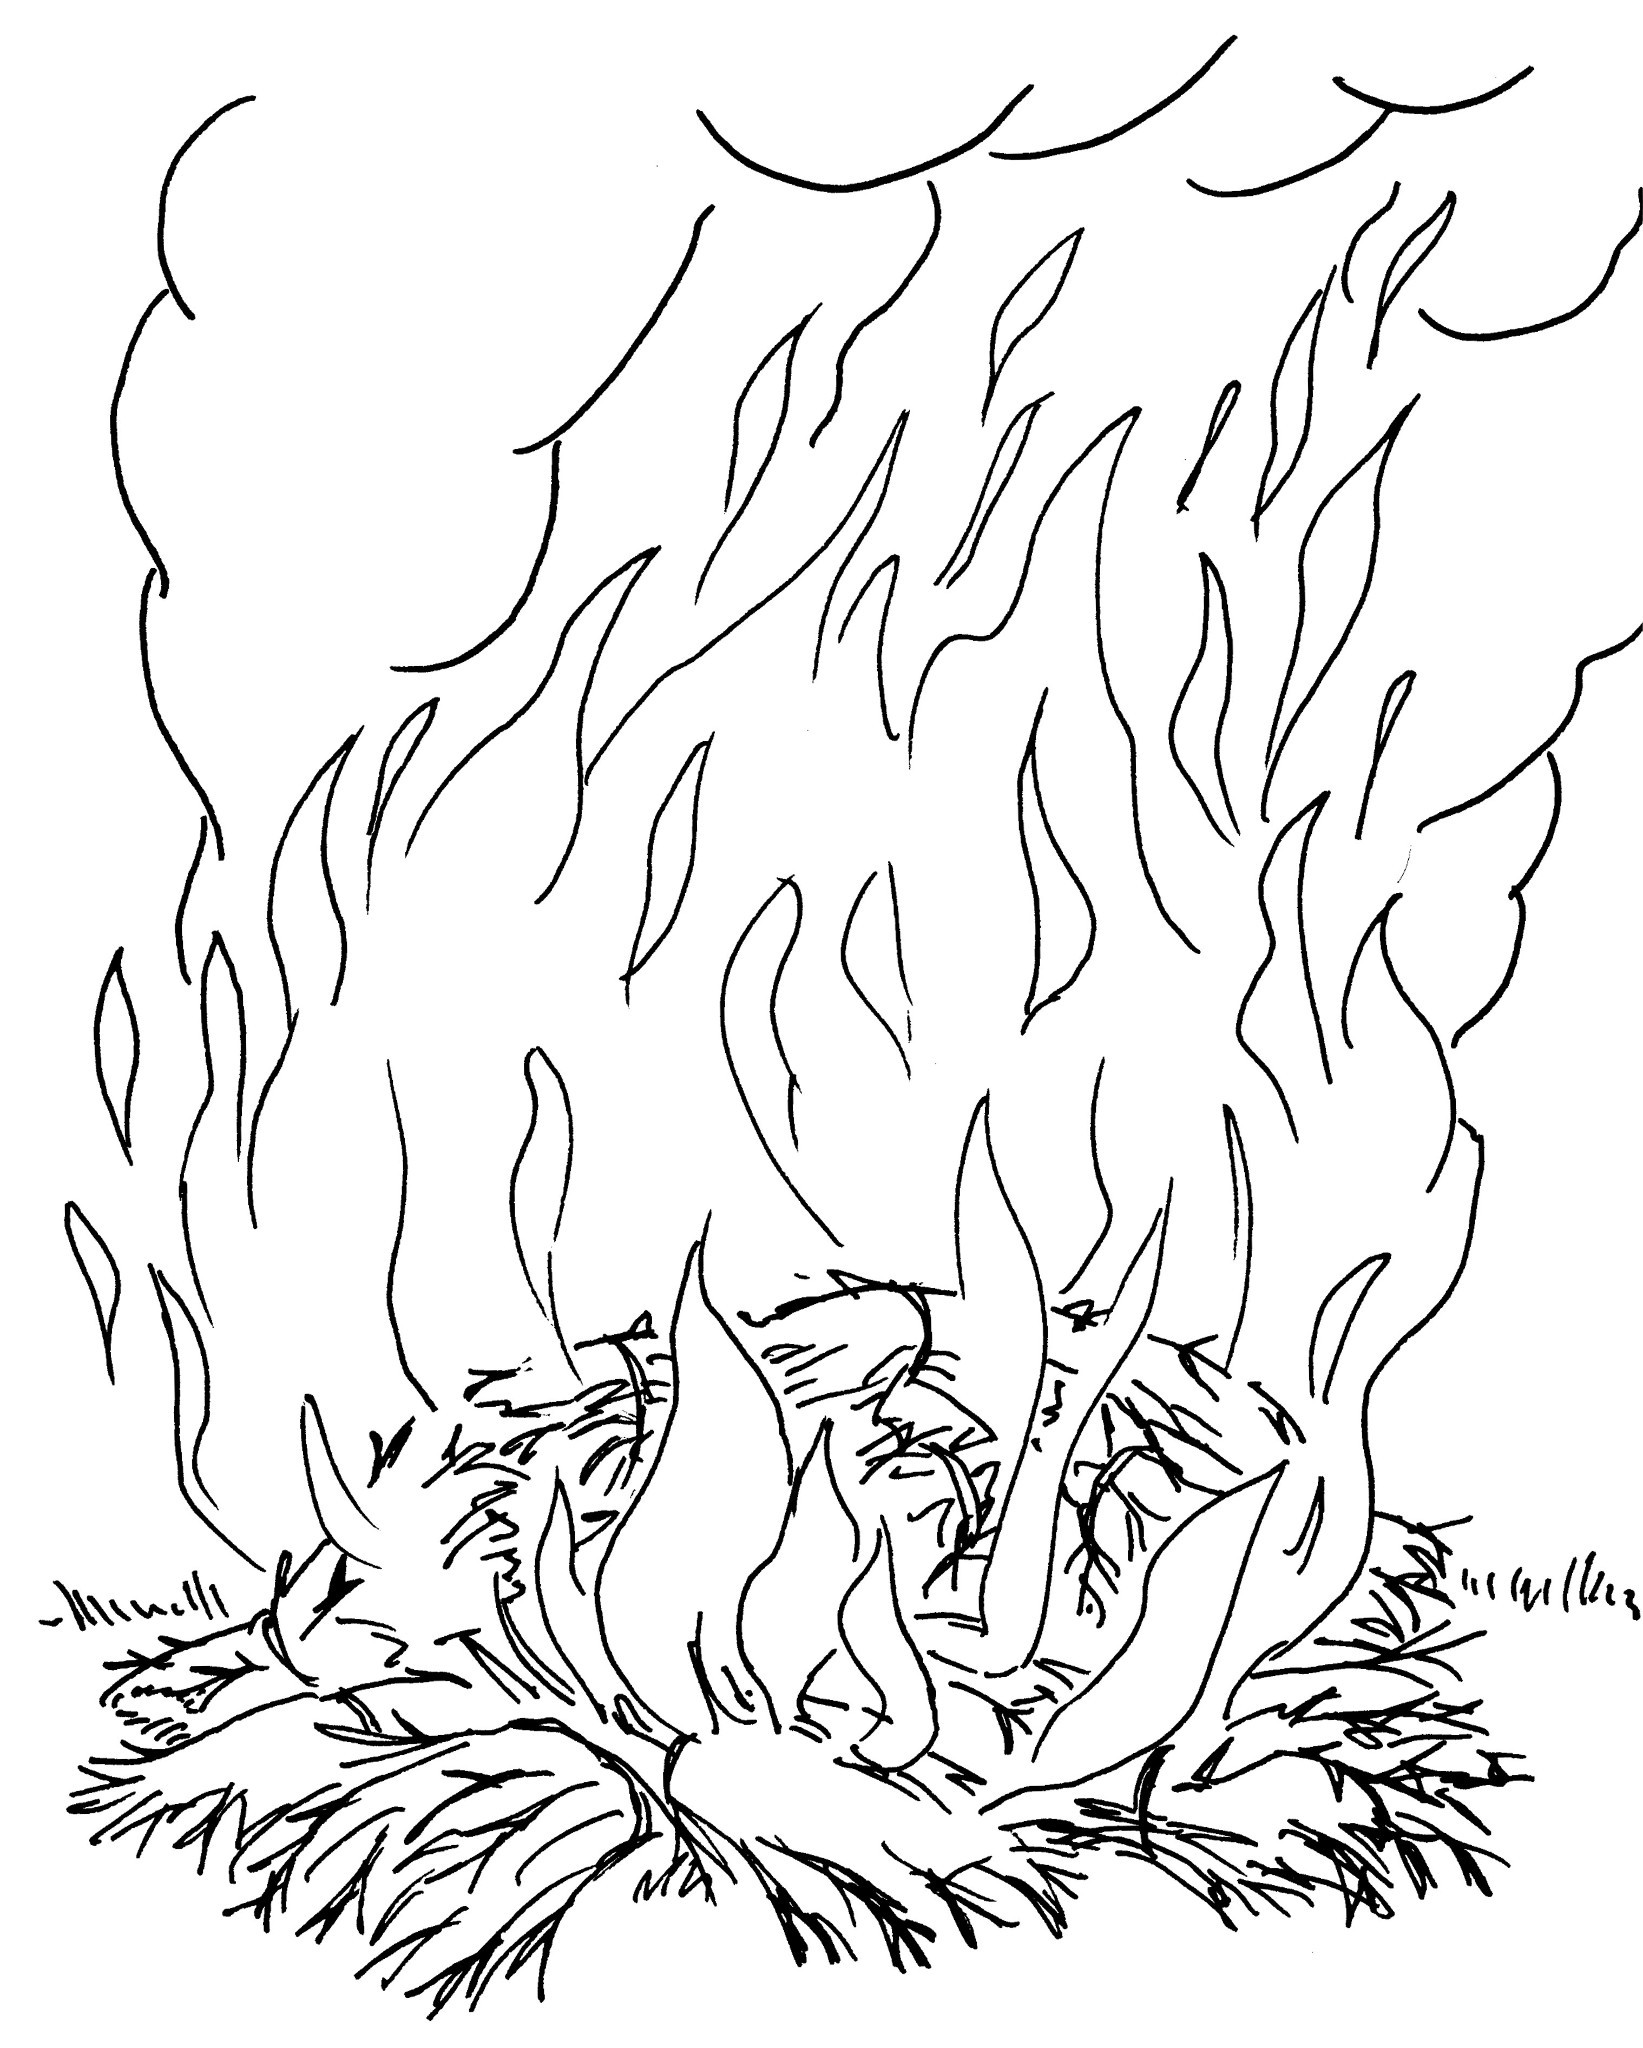 17 dessins de coloriage oiseau de feu imprimer. Black Bedroom Furniture Sets. Home Design Ideas